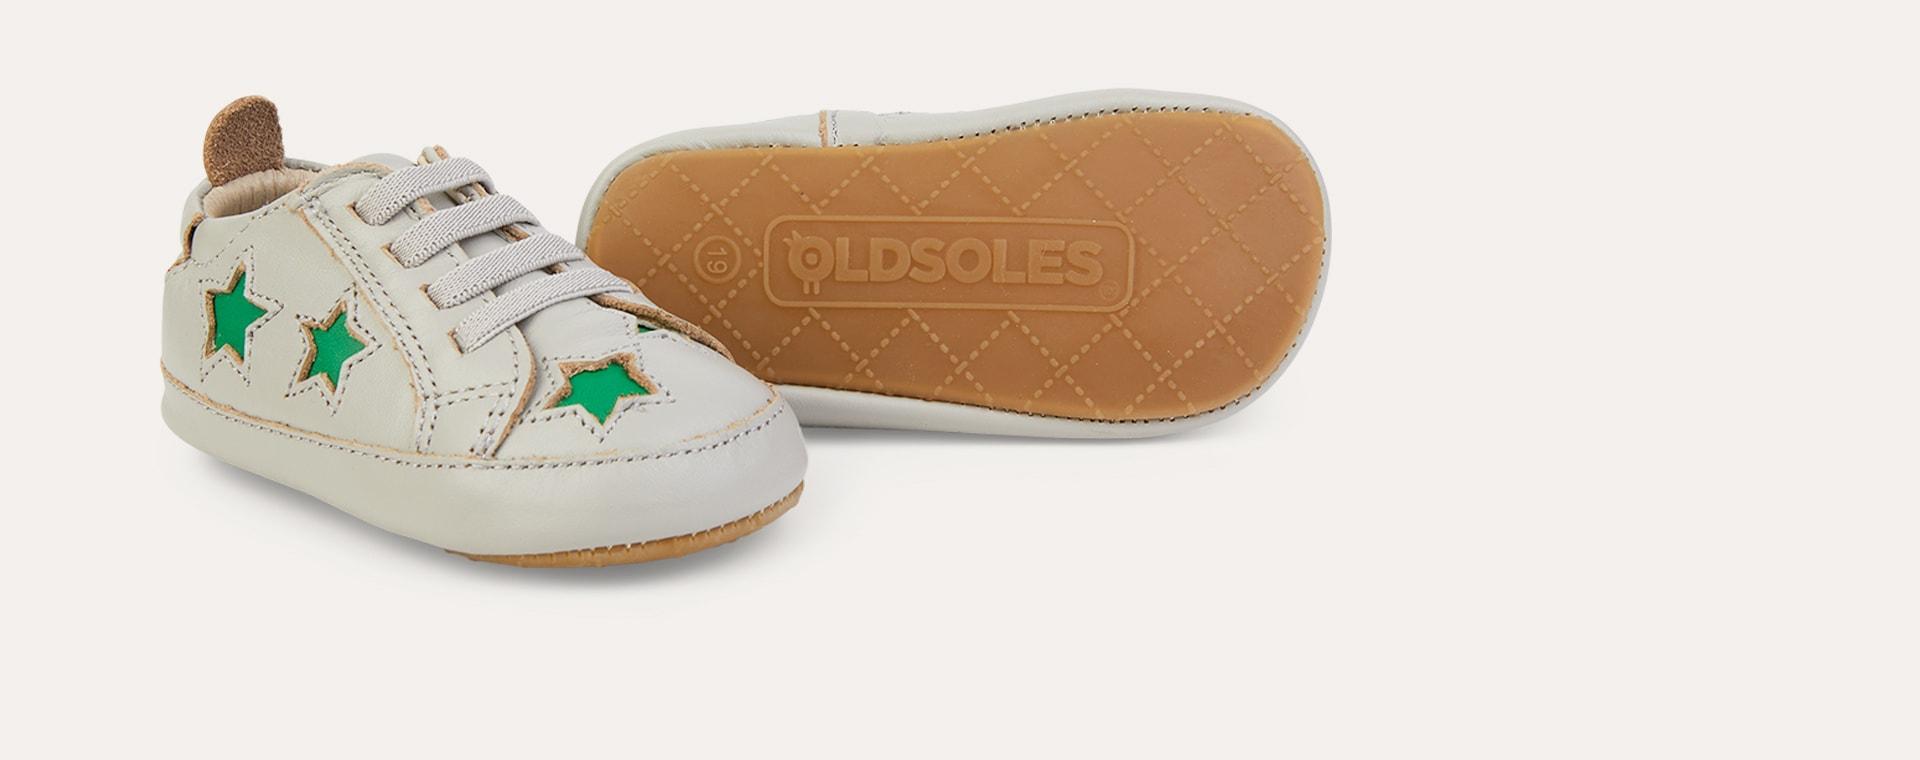 Grey/Neon Green old soles Starey Bambini